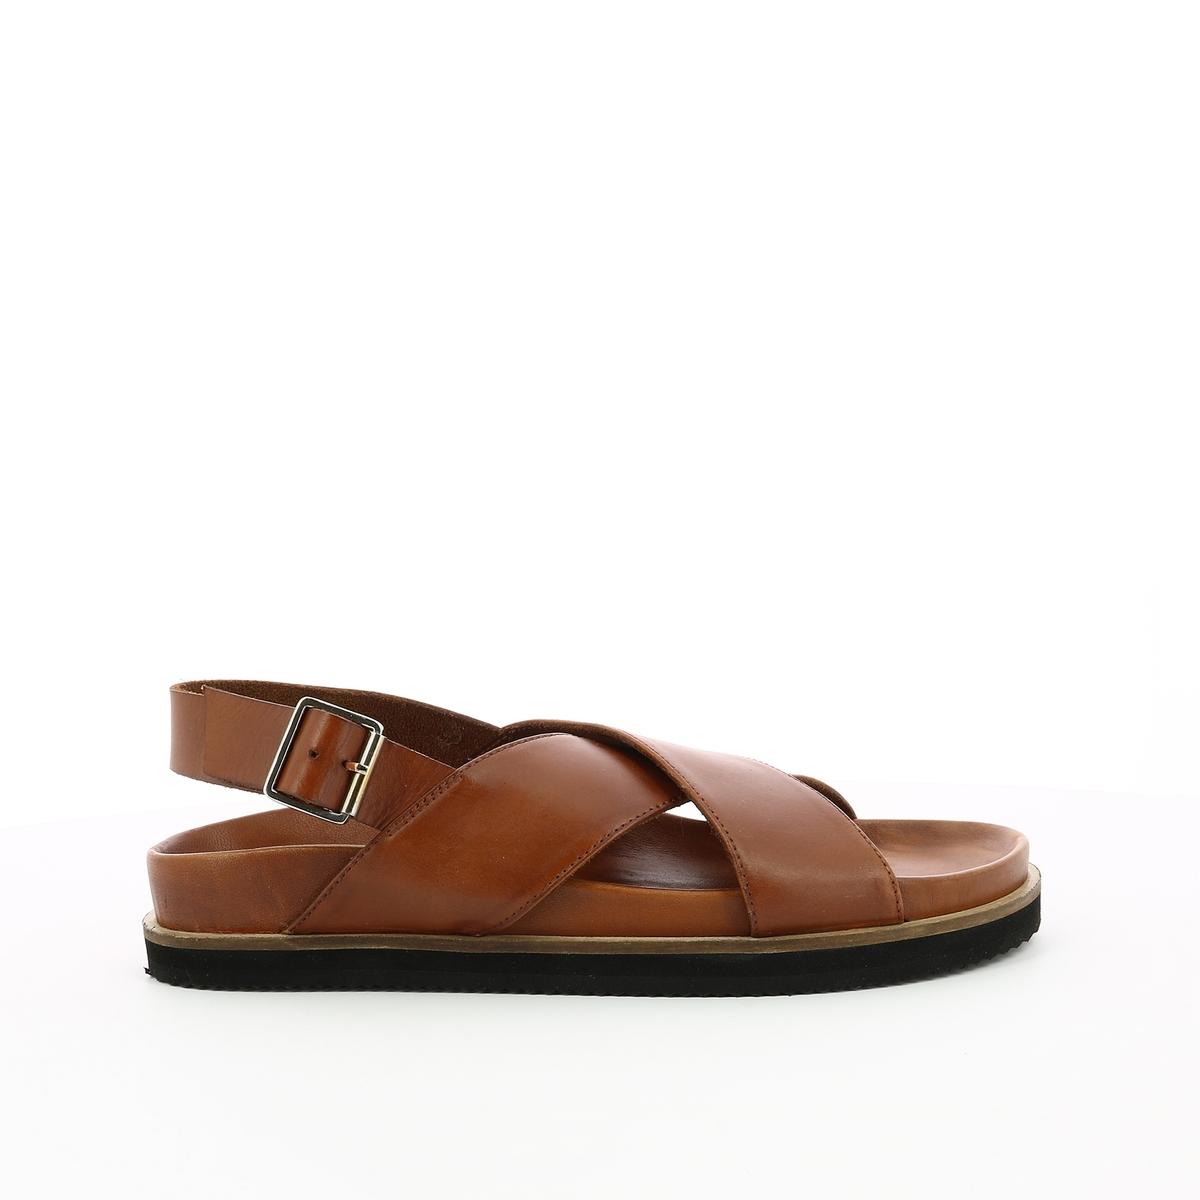 Босоножки кожаные Sandross цены онлайн